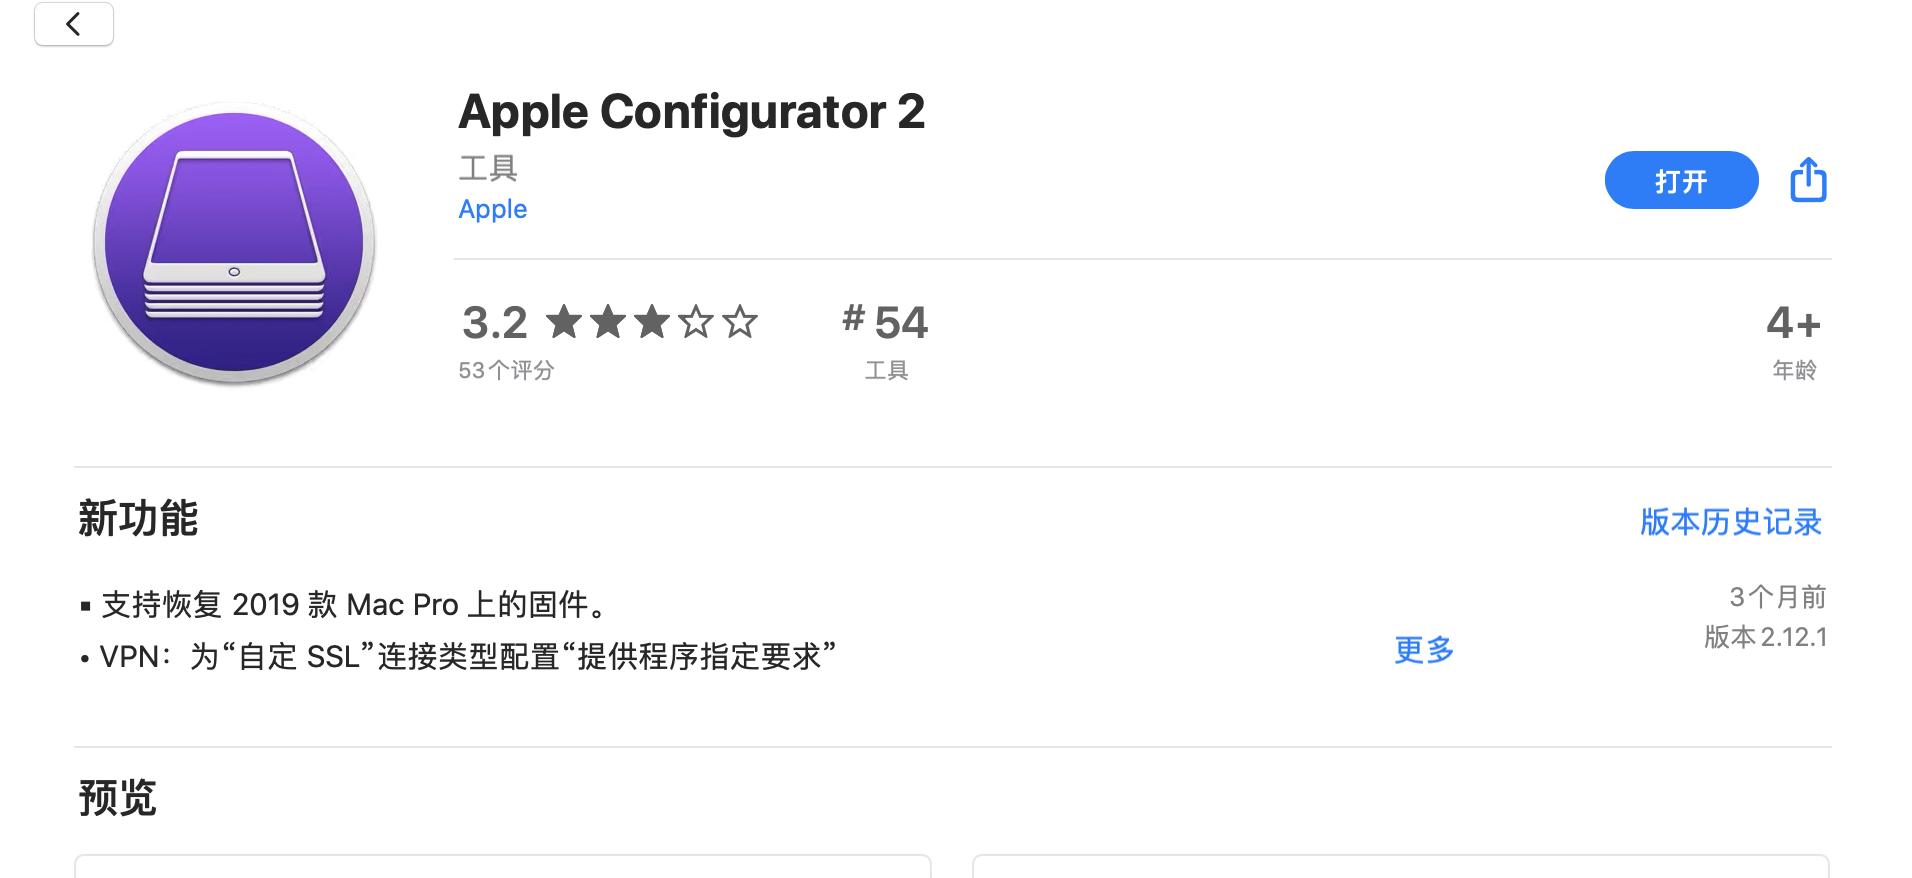 iOS WebClip生成和签名以及发布